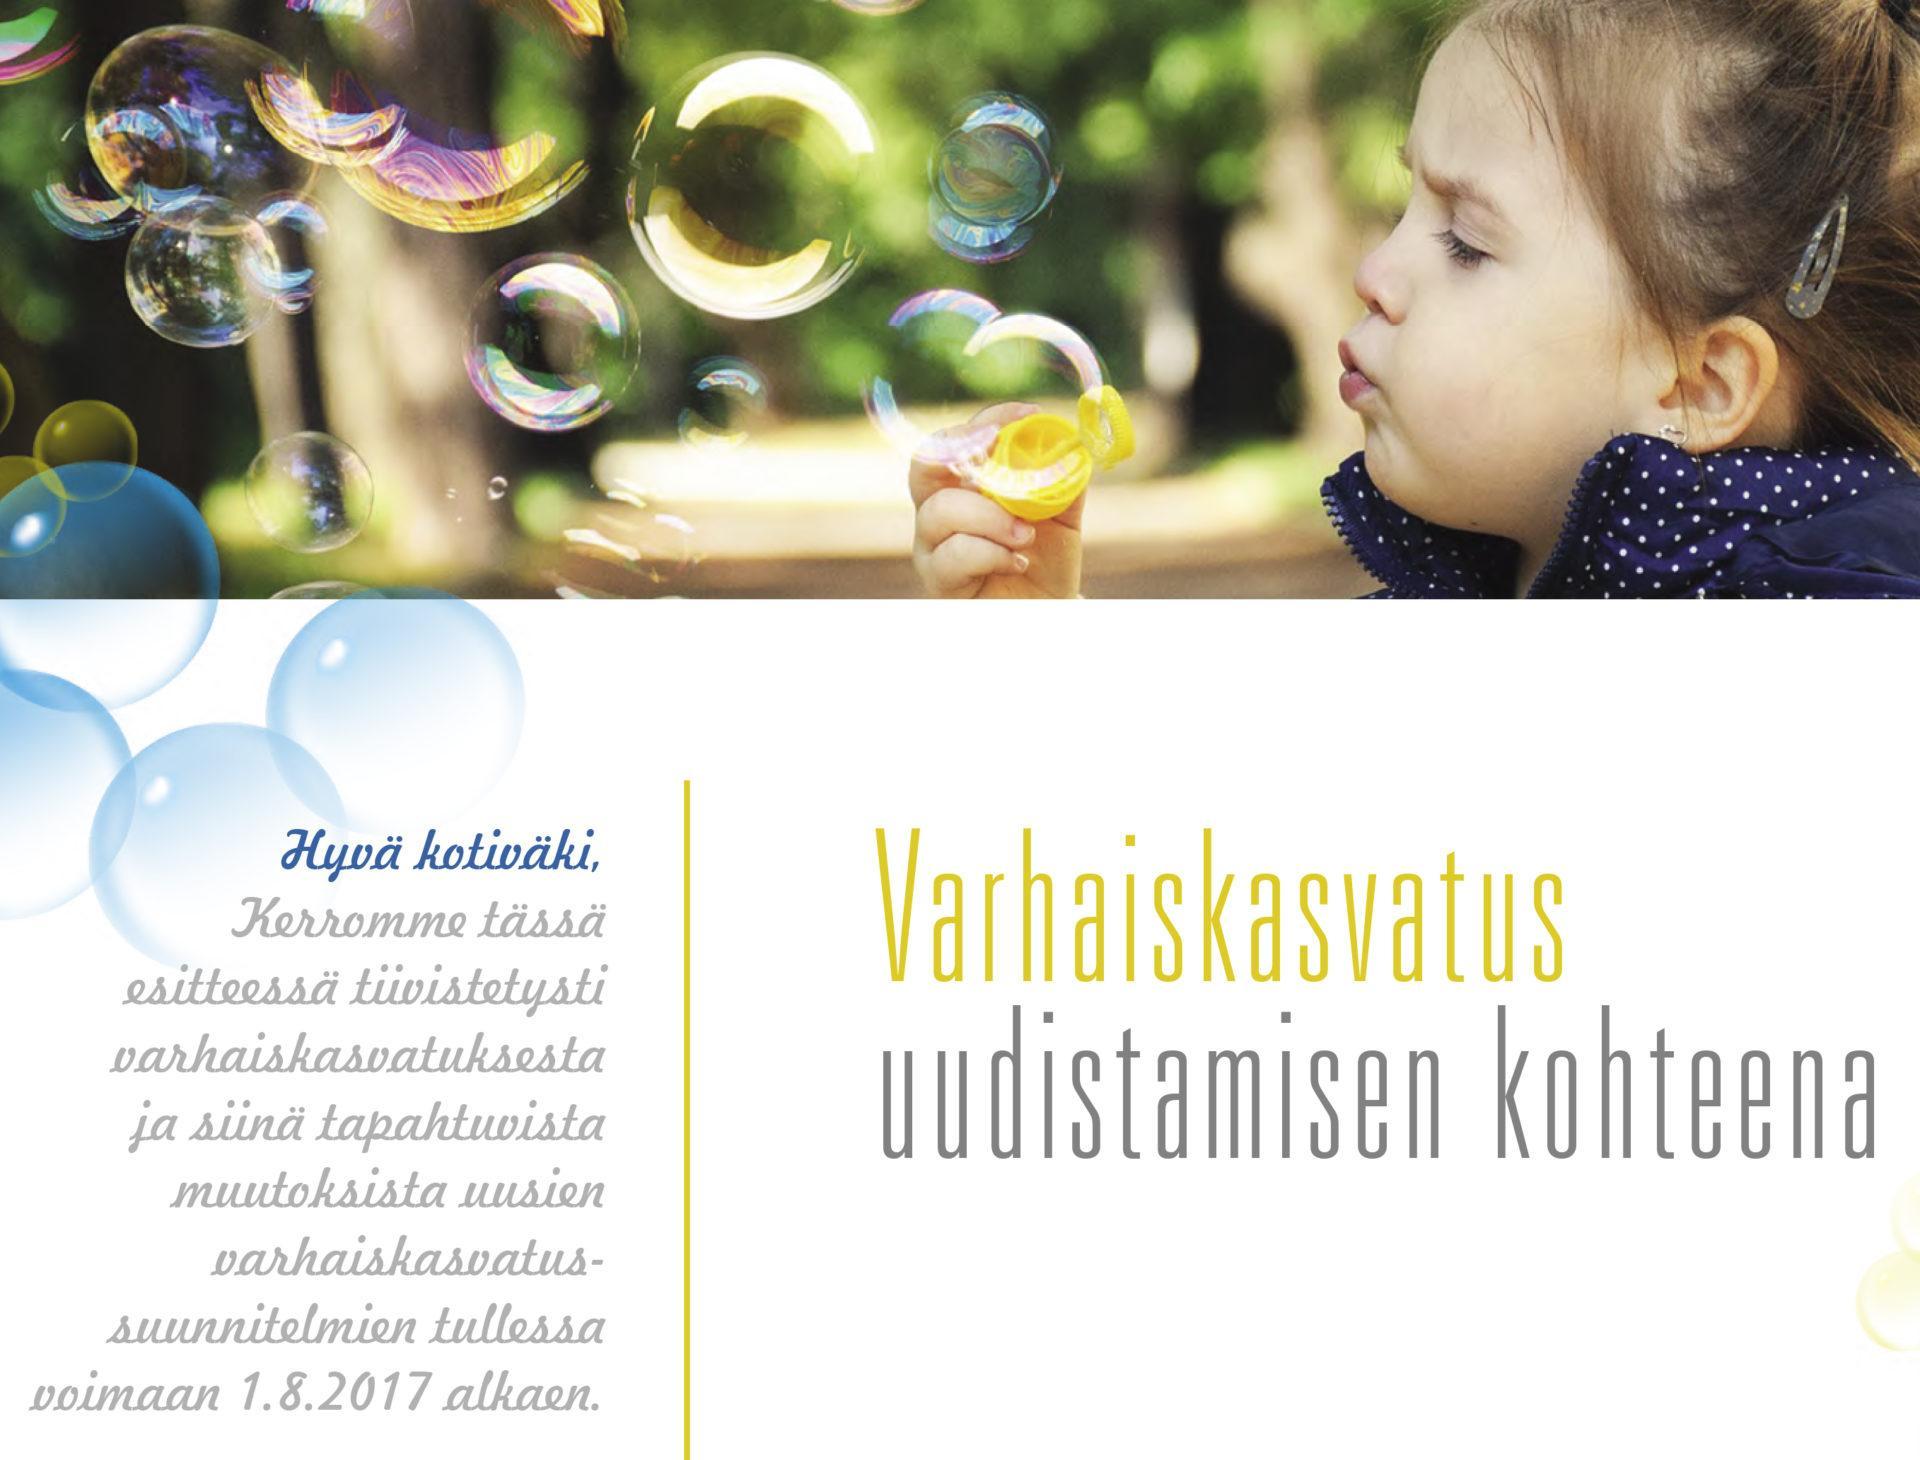 Etusivu: Varhaiskasvatus uudistamisen kohteena 2017